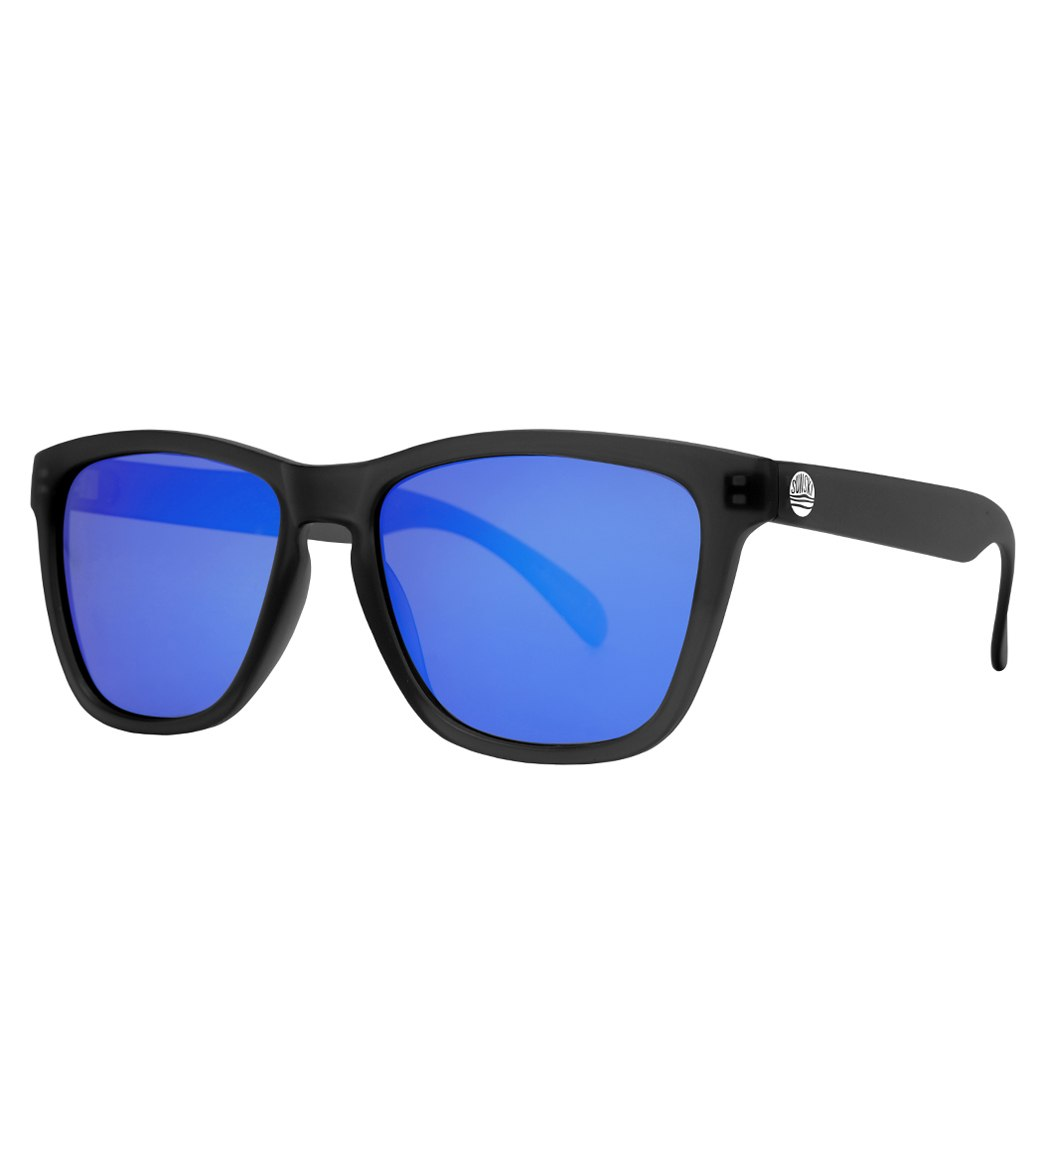 Sunski Headlands Polarized Sunglasses at SwimOutlet.com 0a6ca47421